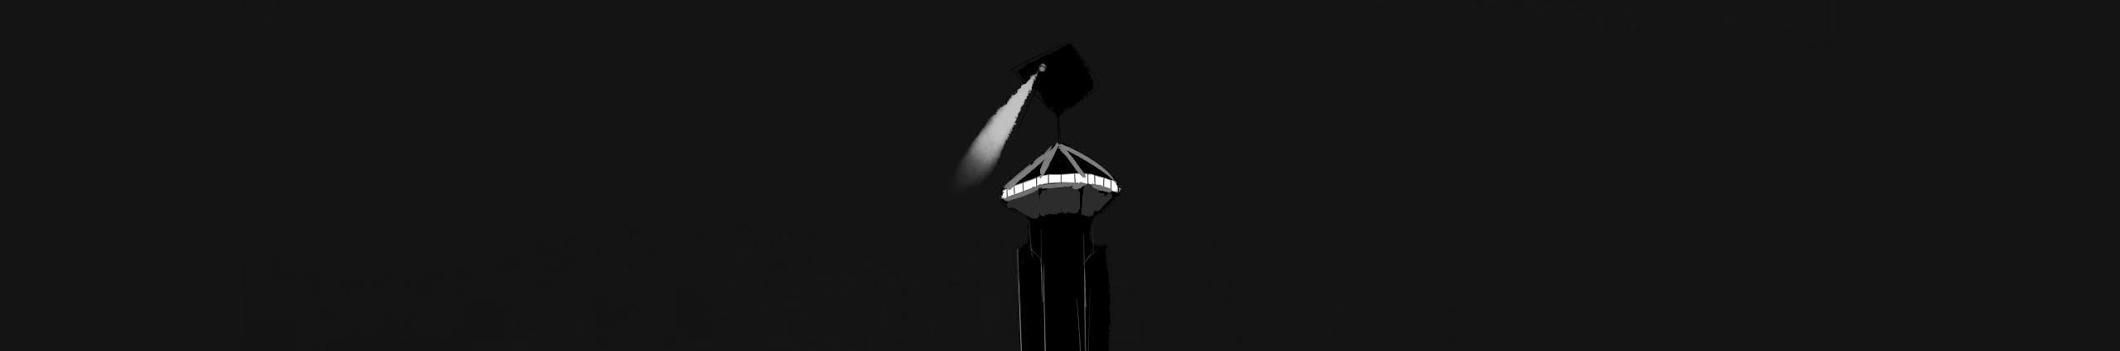 Monochrome Pause